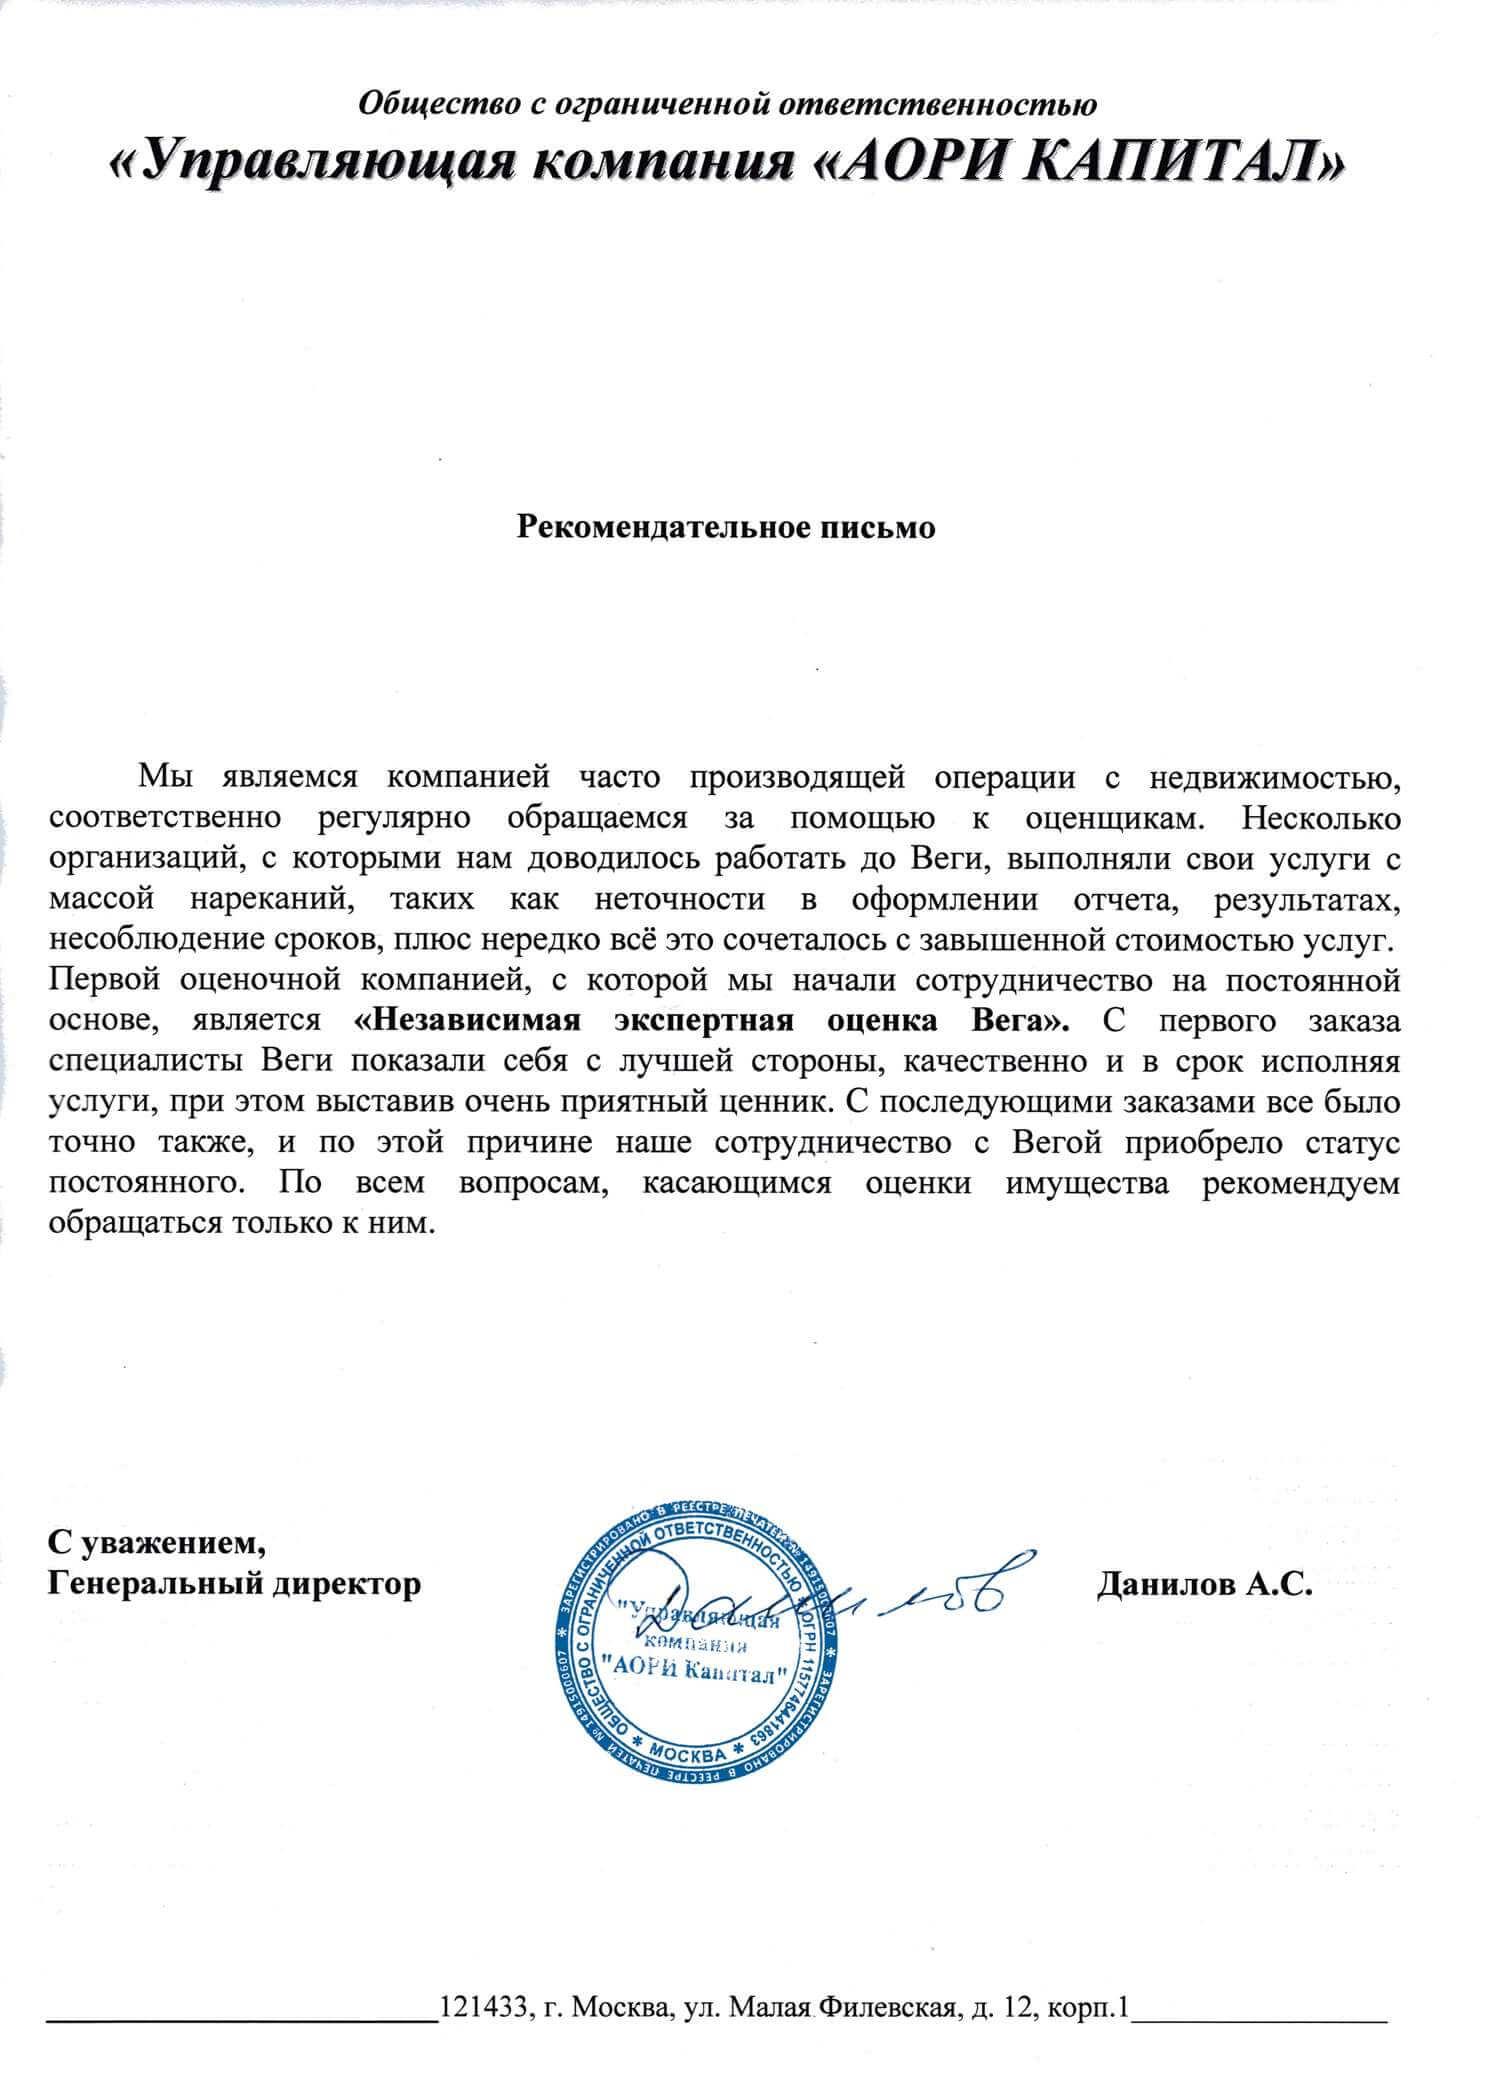 Отзыв от ООО «Управляющая компания «АОРИ КАПИТАЛ»